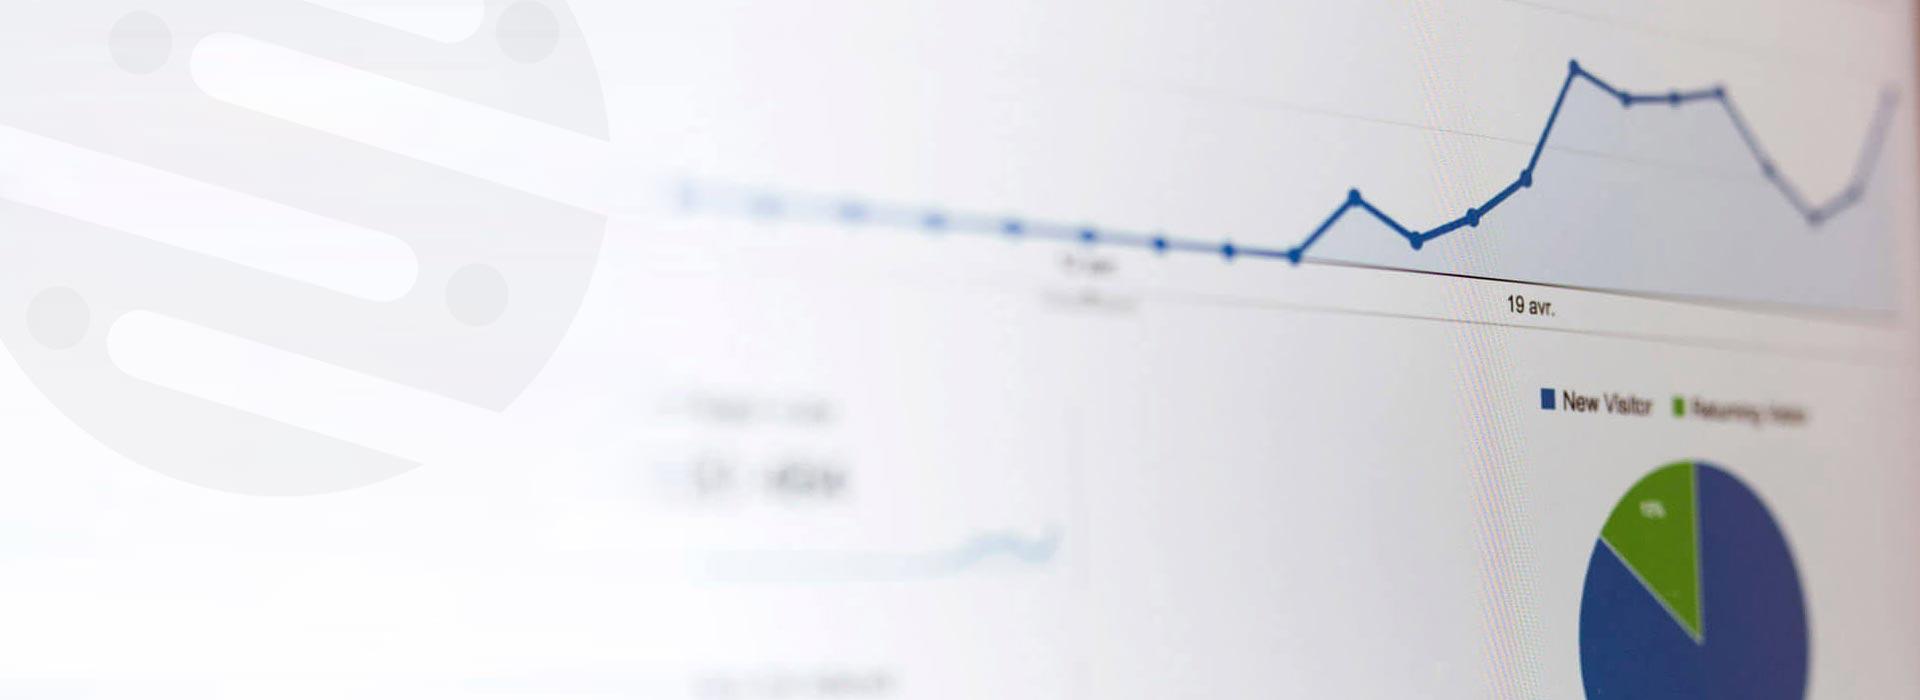 Digital Marketing in Affordable Digits